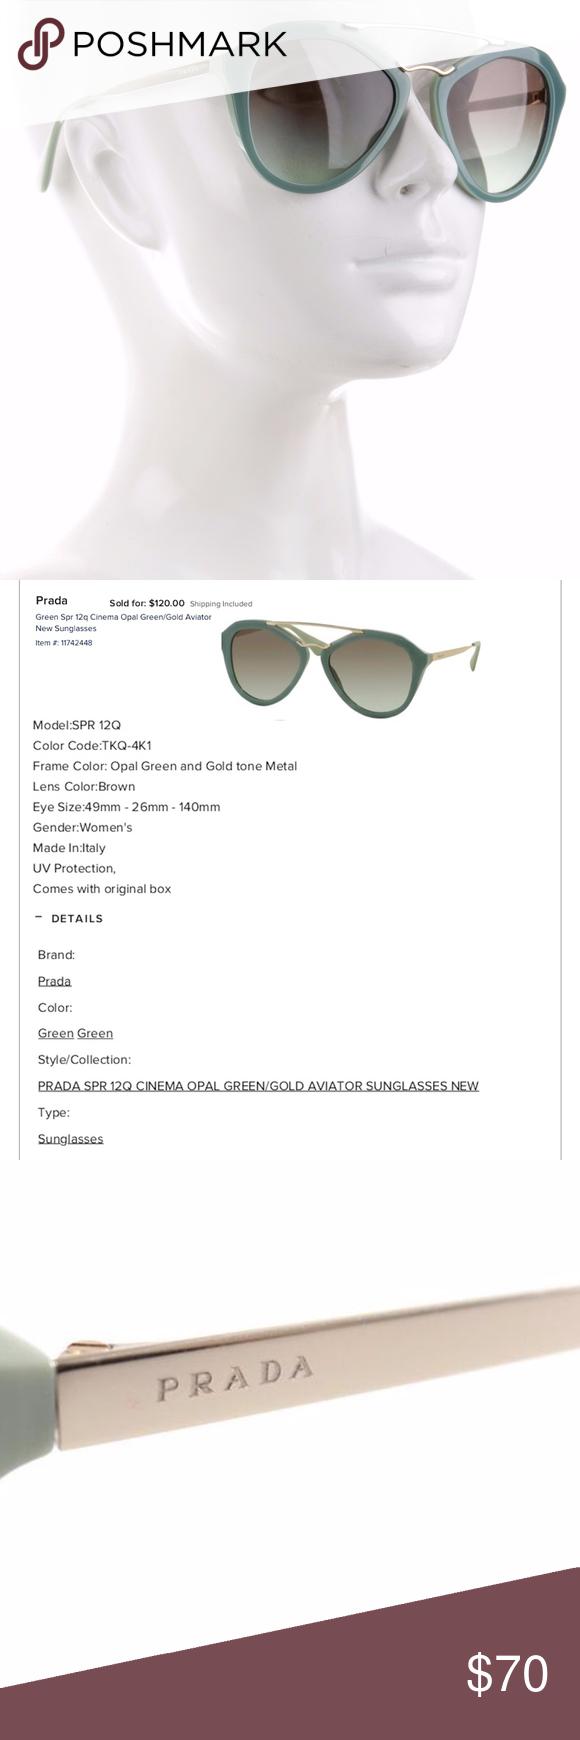 c880bc681c54 ... australia prada sunglasses prada sunglasses mint condition never worn  acetate metal aviator sunglasses b89fa 75185